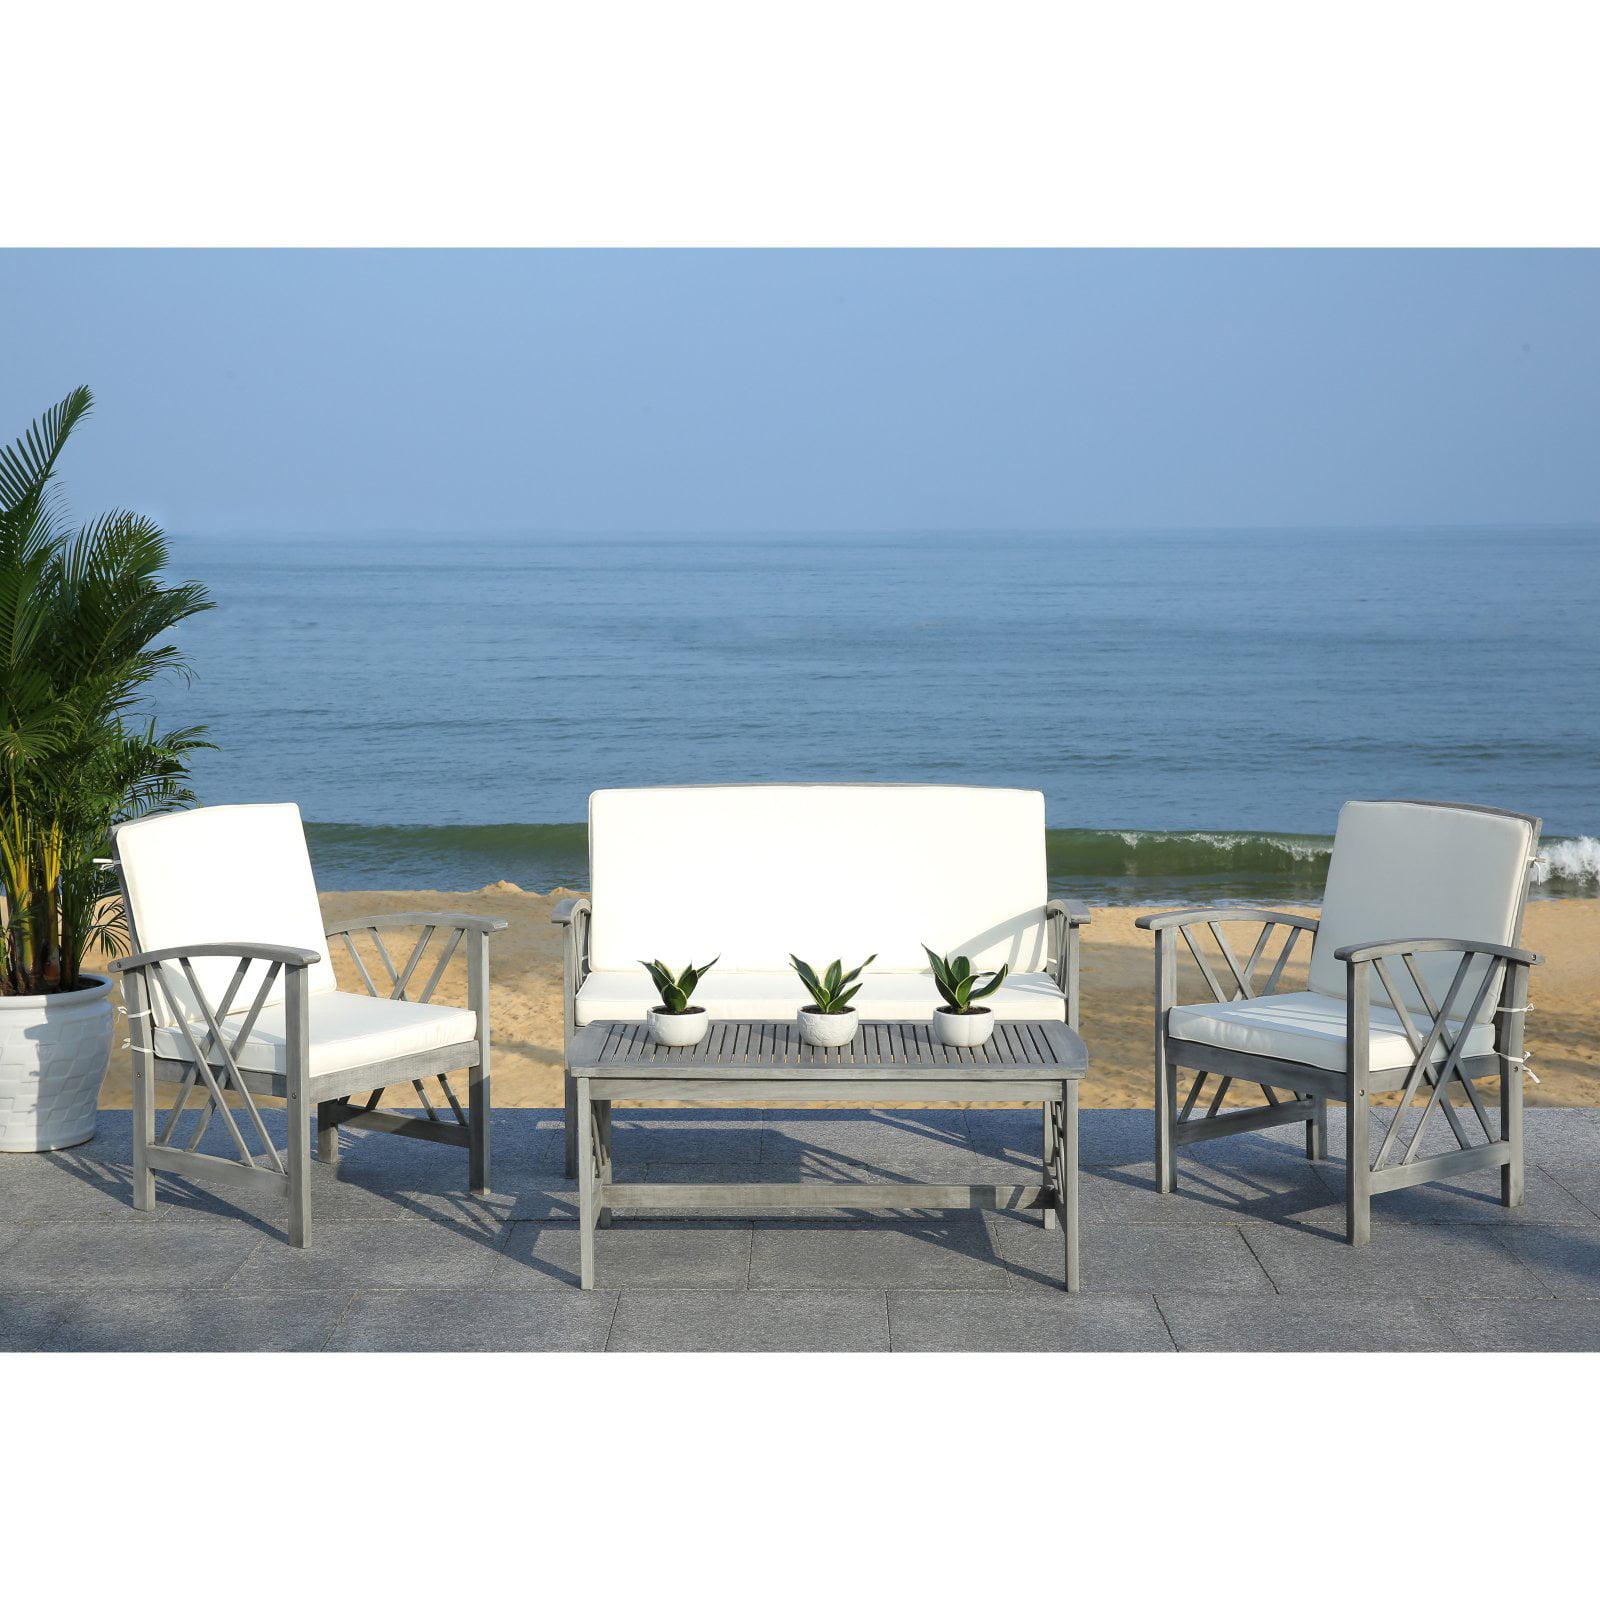 Safavieh Fontana Outdoor Modern 4 Piece Living Set with Cushion